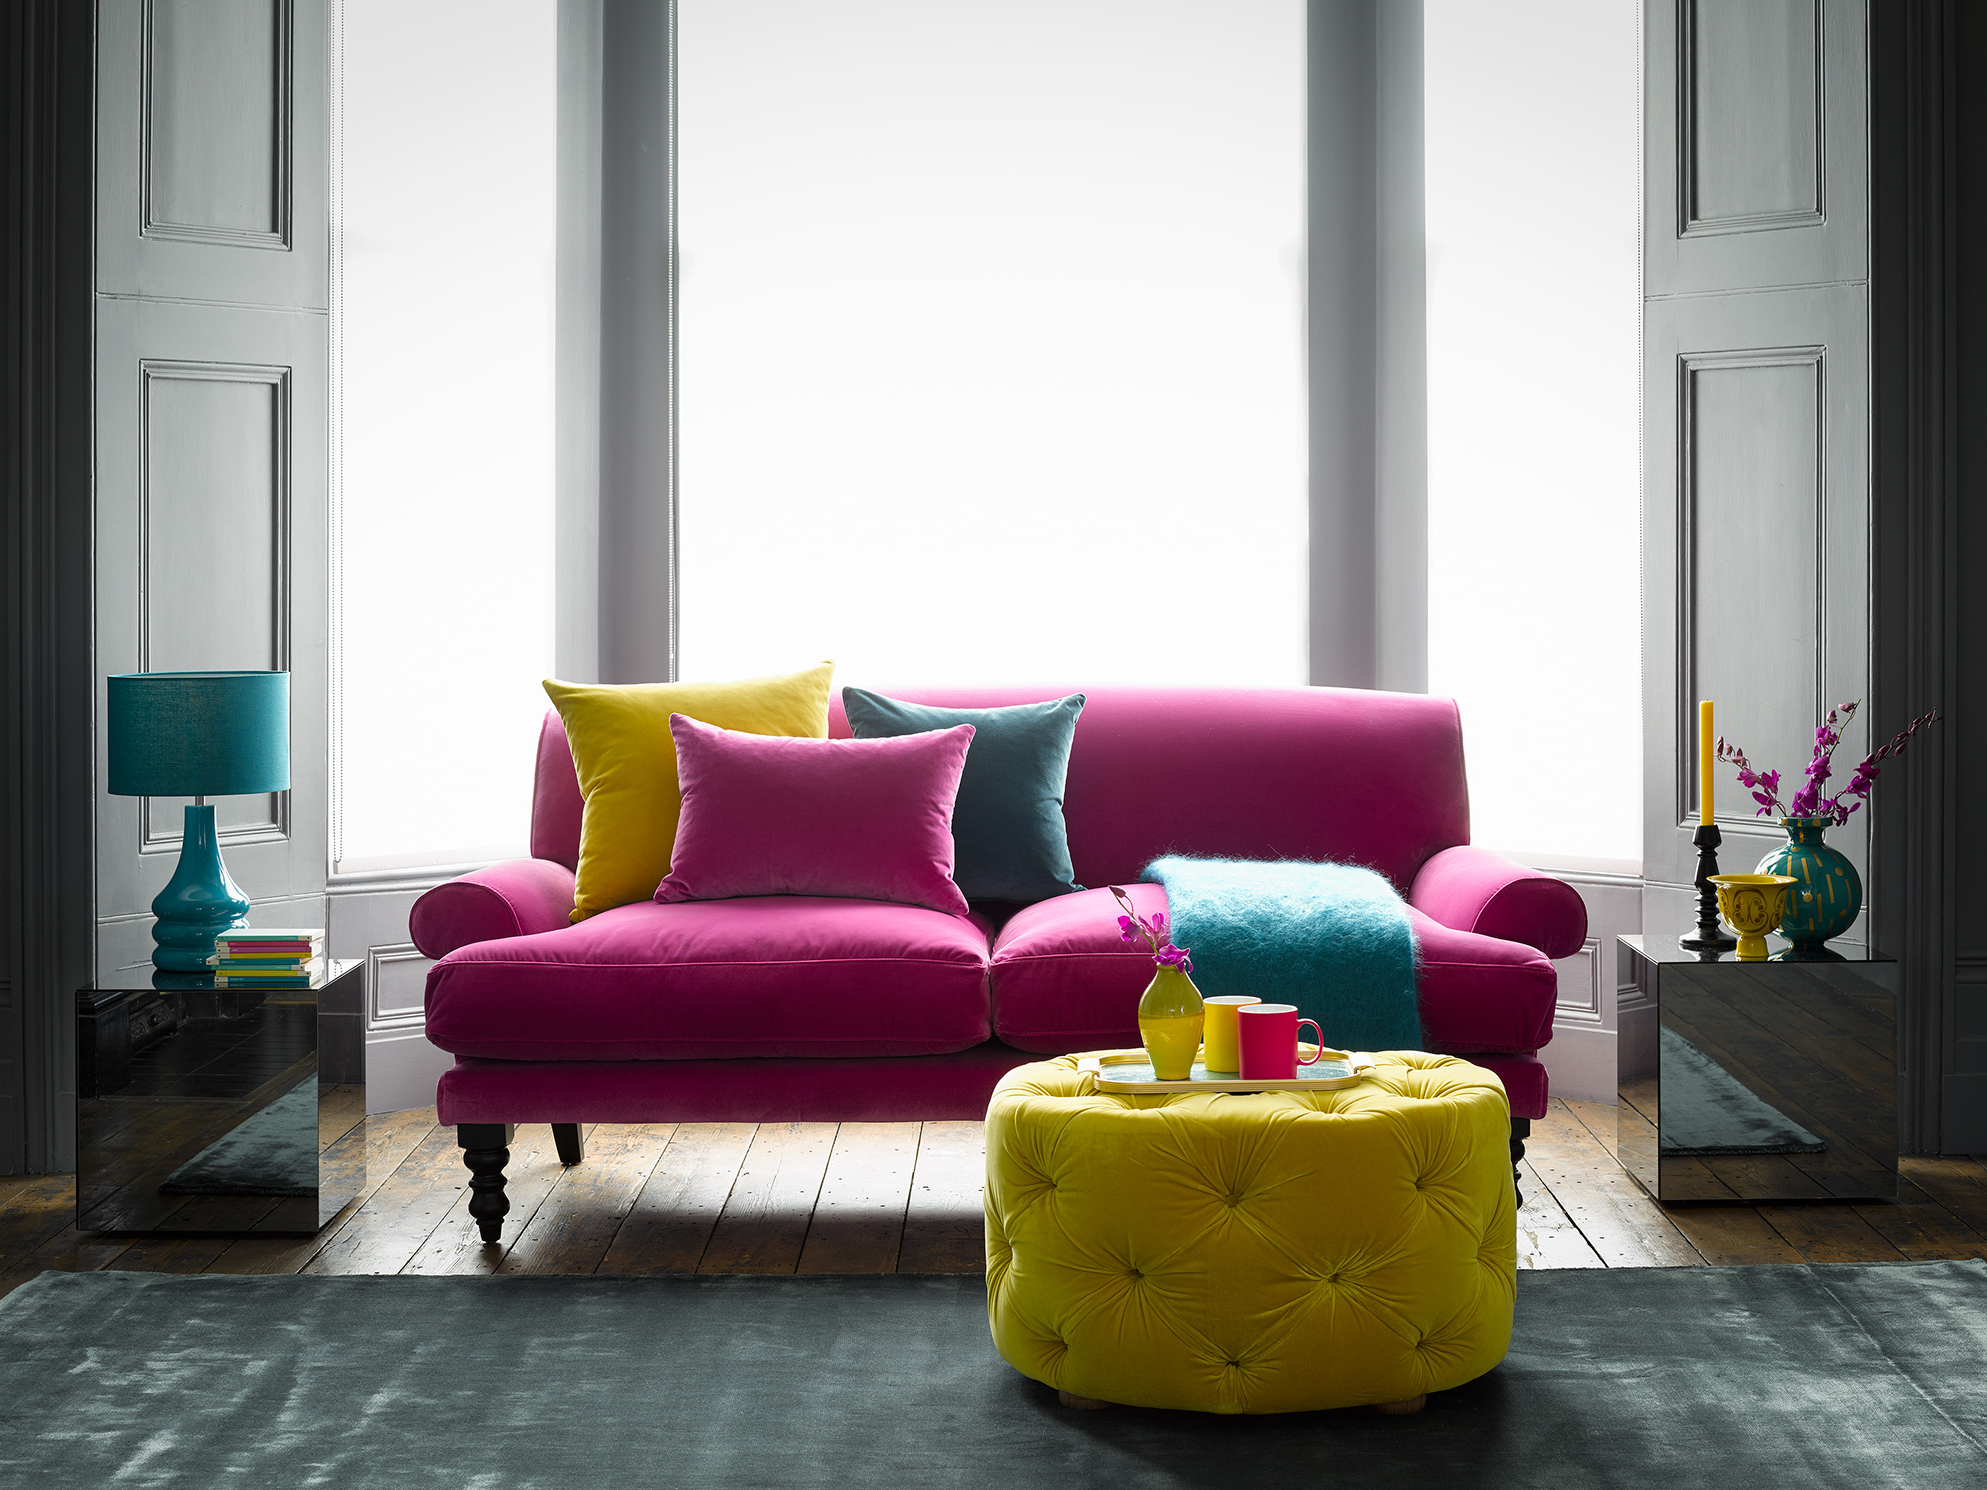 Sofa Com E6d5 Will It Fit Meet Our Breakdownable sofas Inspiration Corner